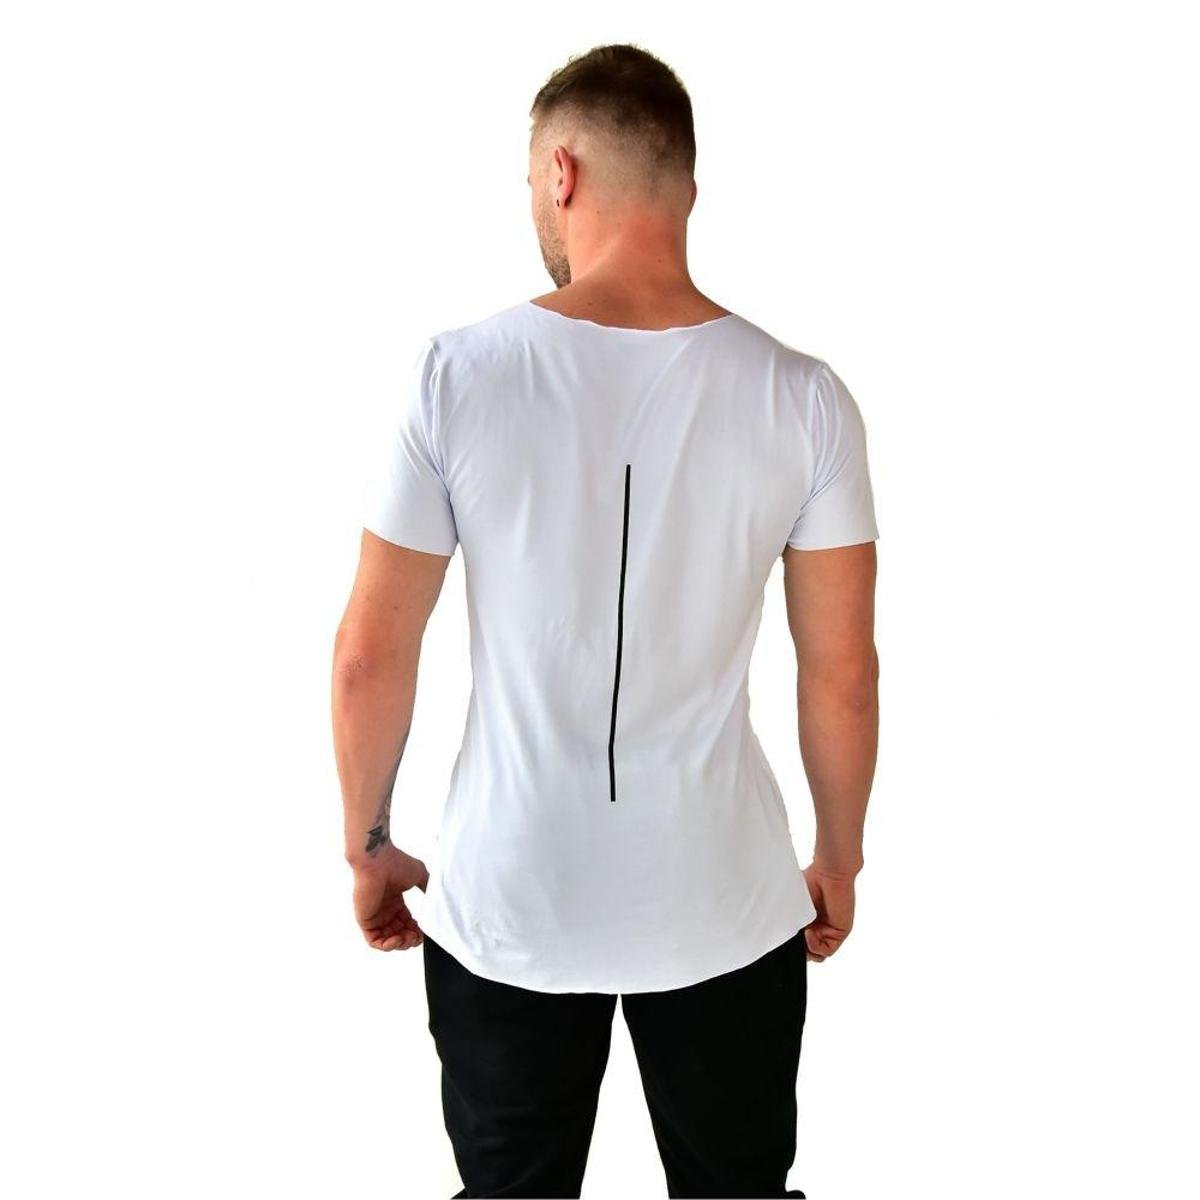 Camiseta Longline Brohood Viscolycra Masculino - Branco